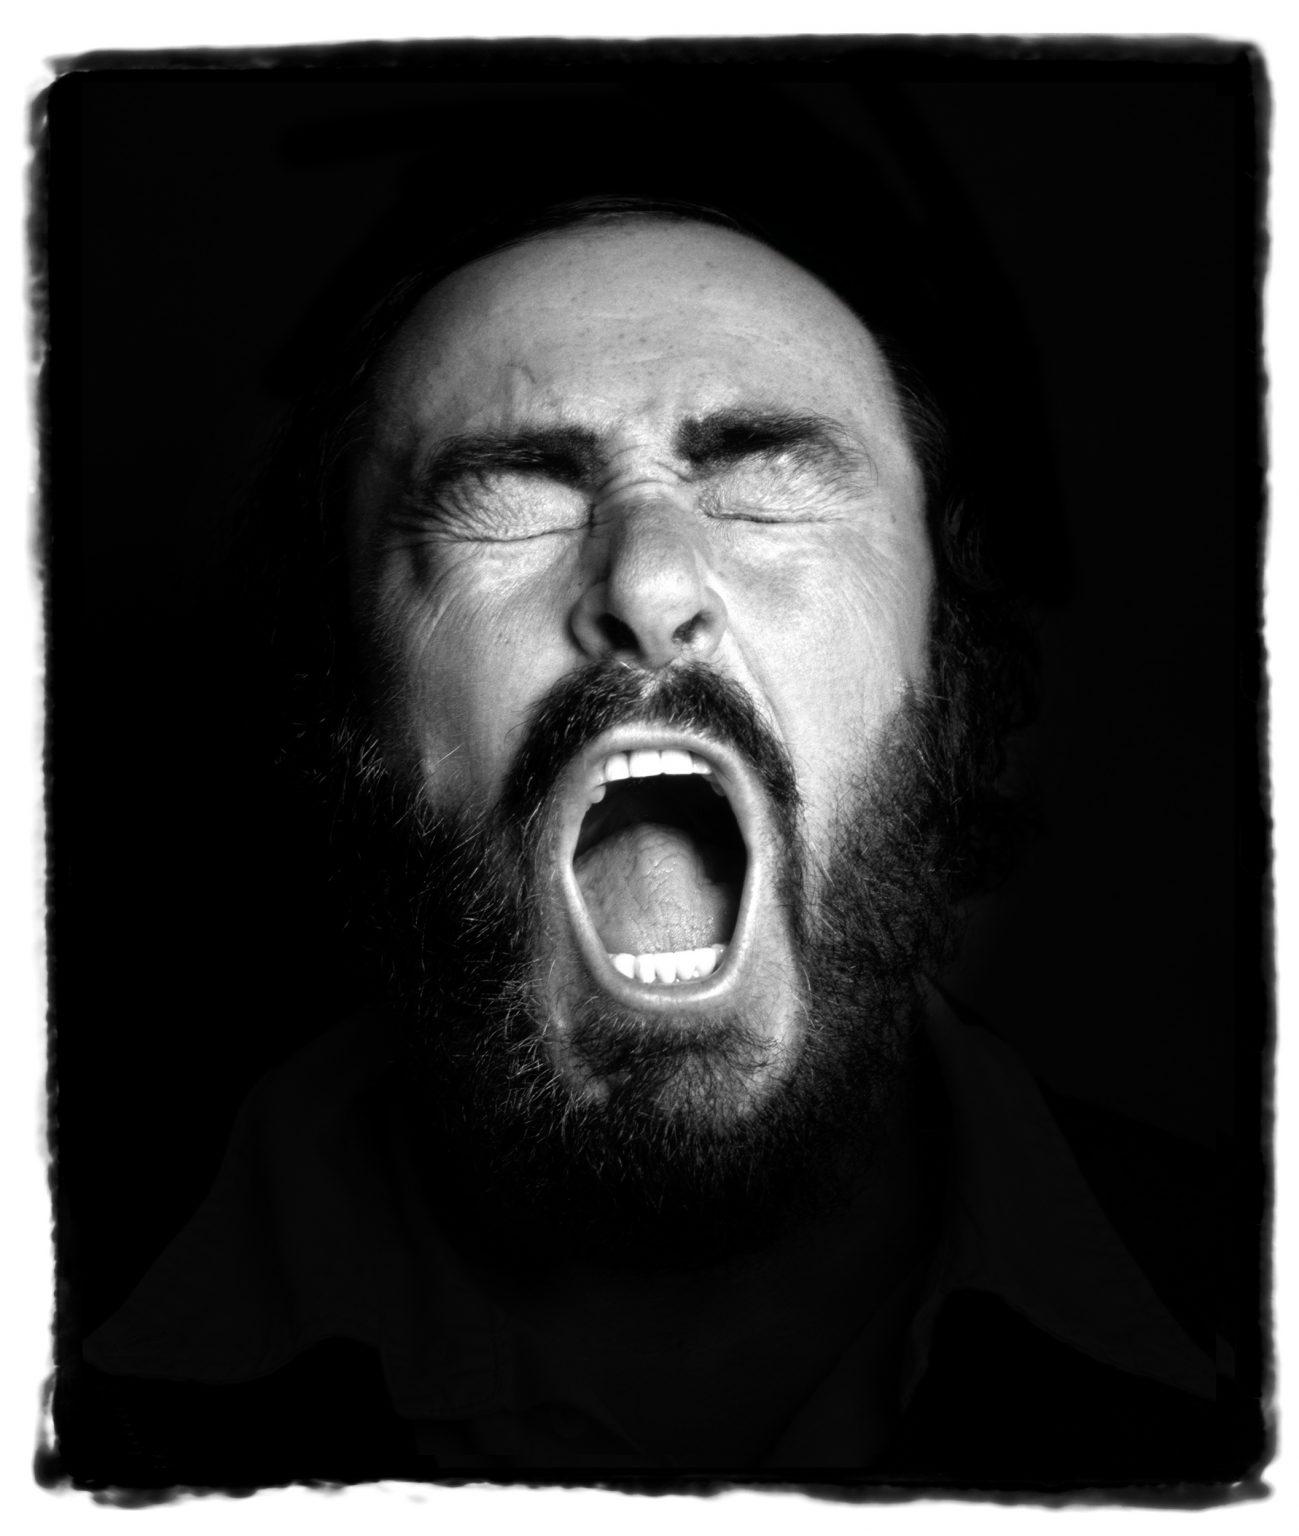 luciano-pavarotti-pesaro-1998-luciano-pavarotti-pesaro-1998